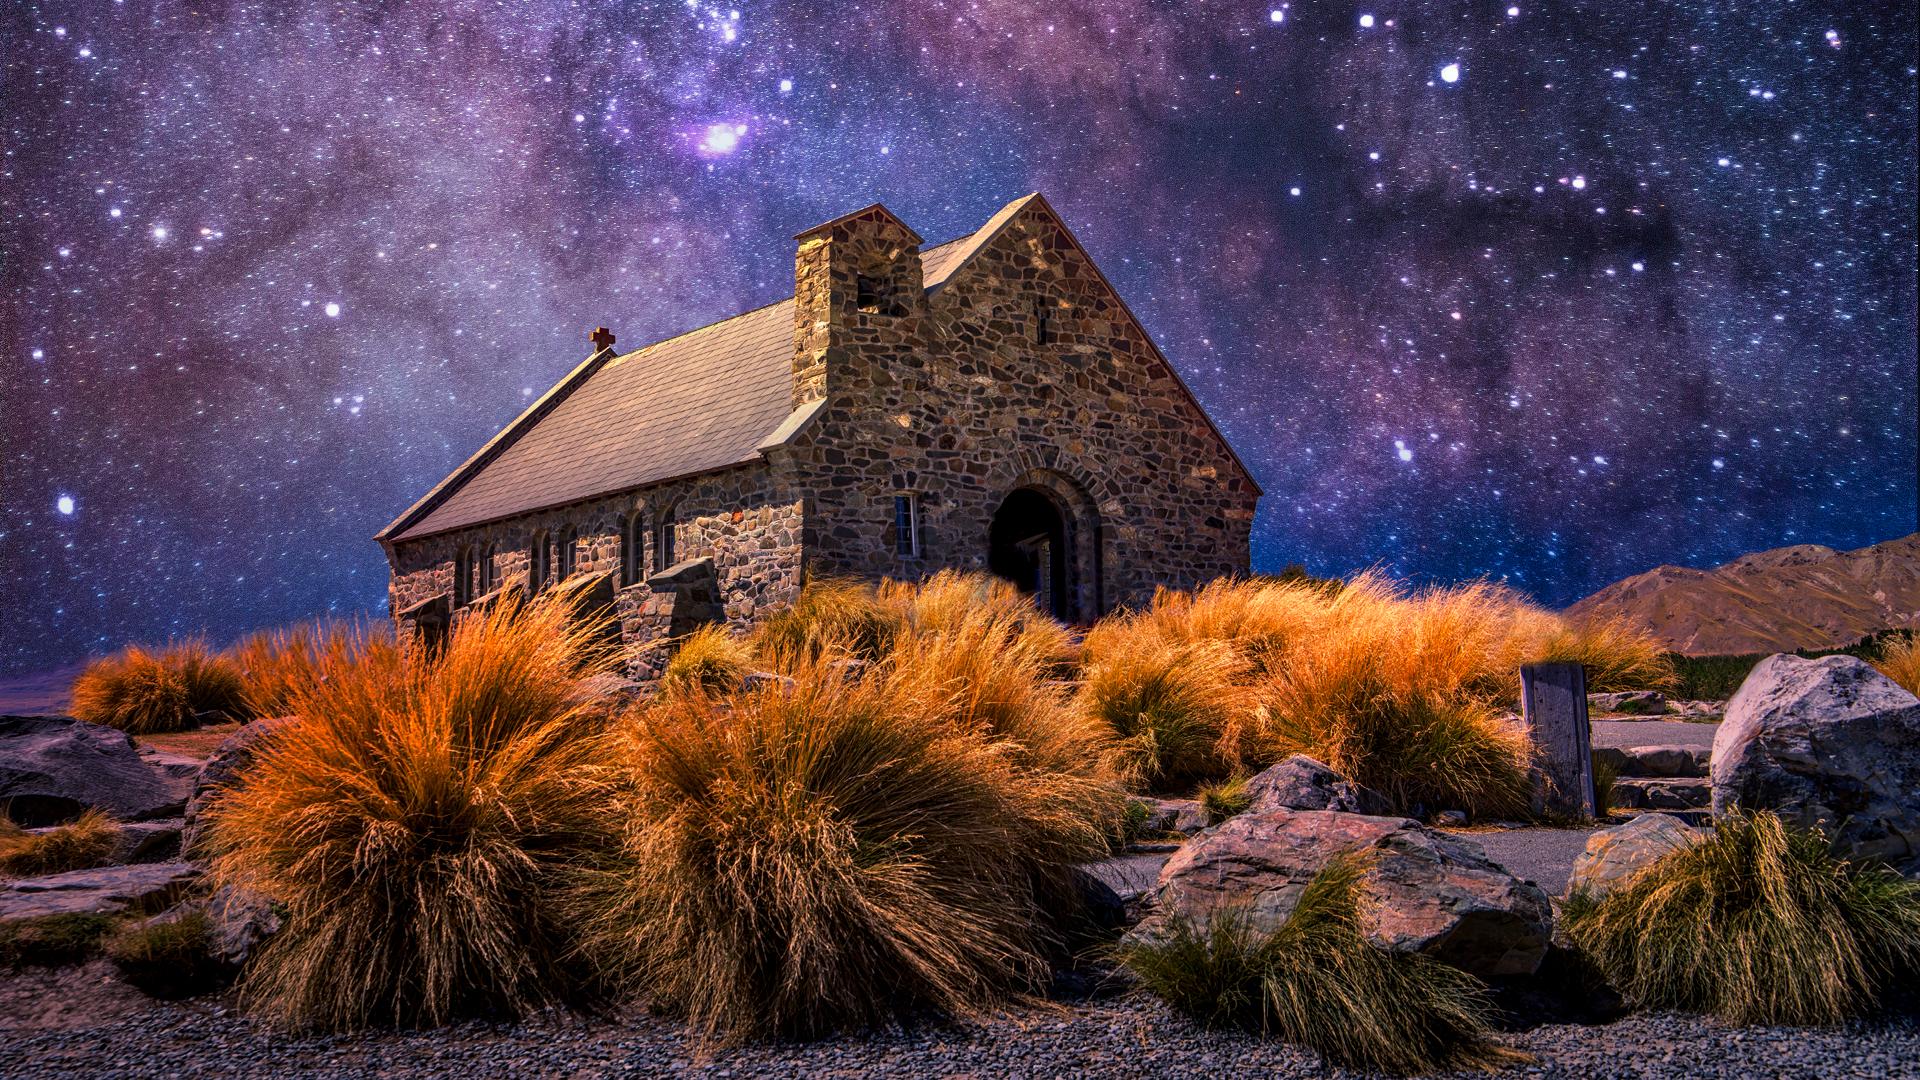 Church of Good Shepherd MW1